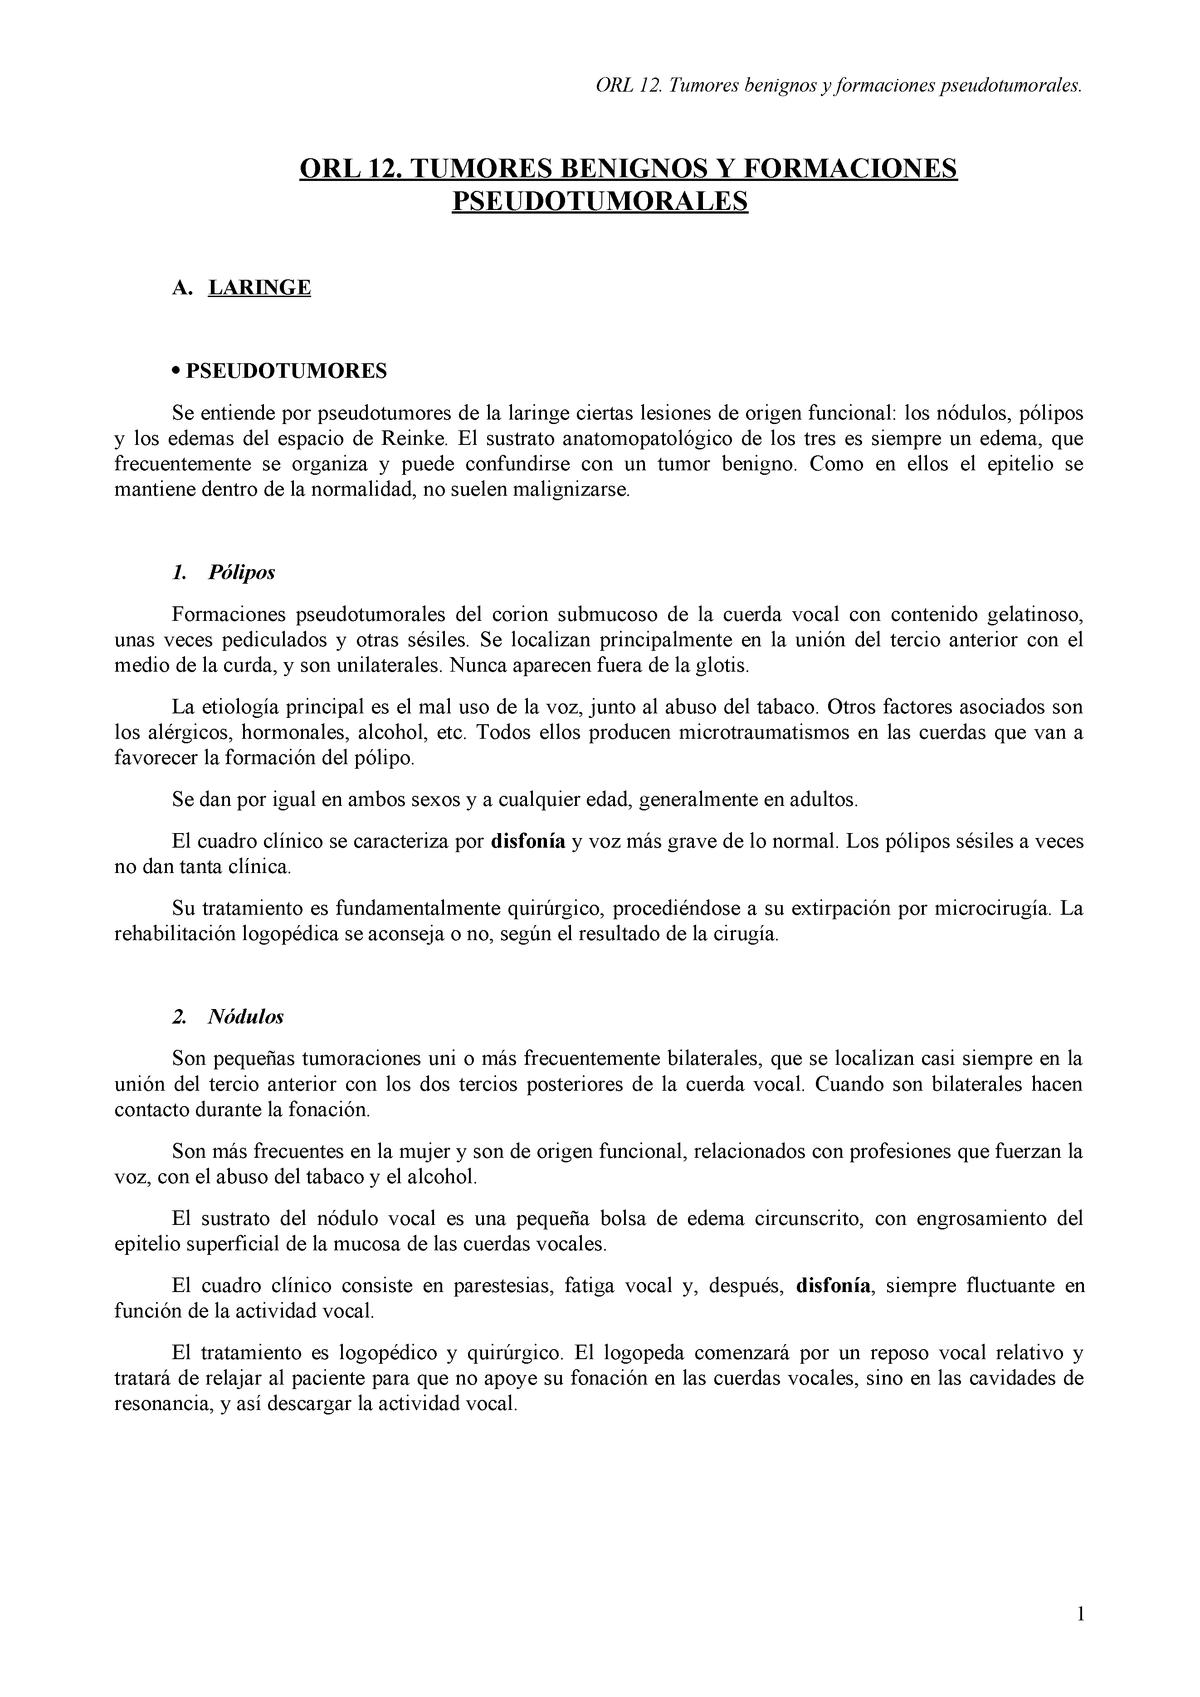 Espacio de reinke funcion